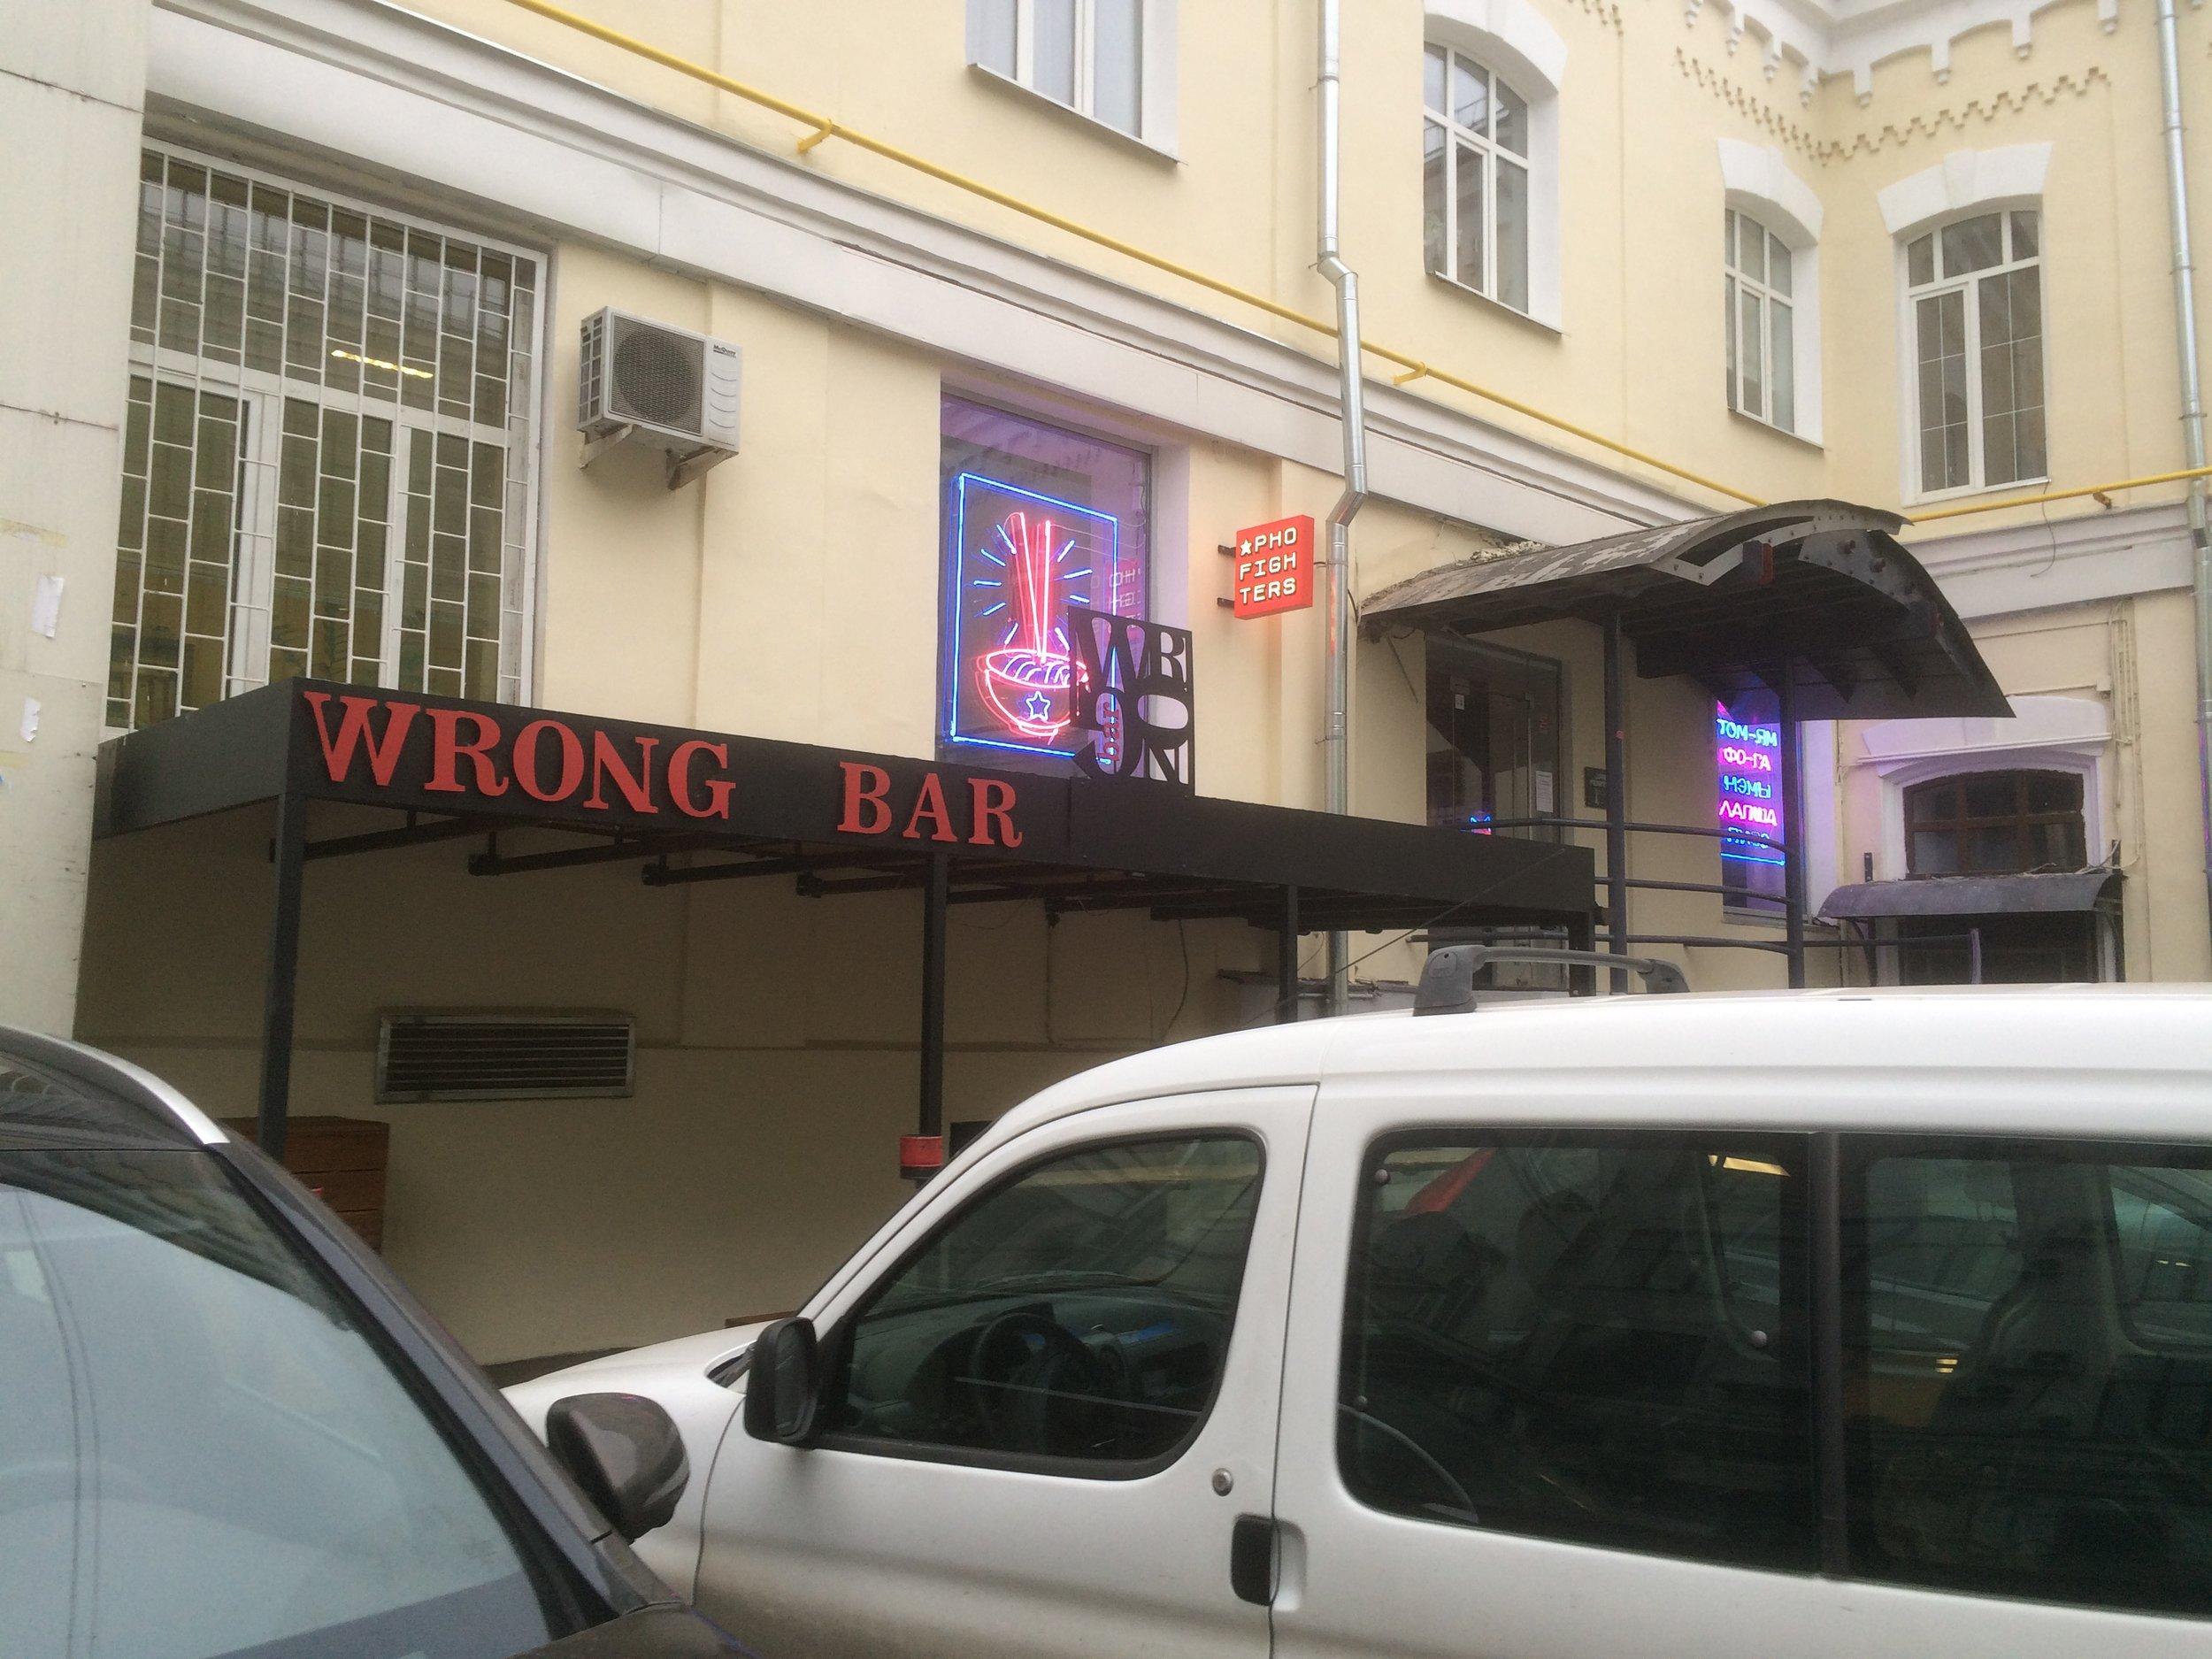 WRONG BAR.jpg